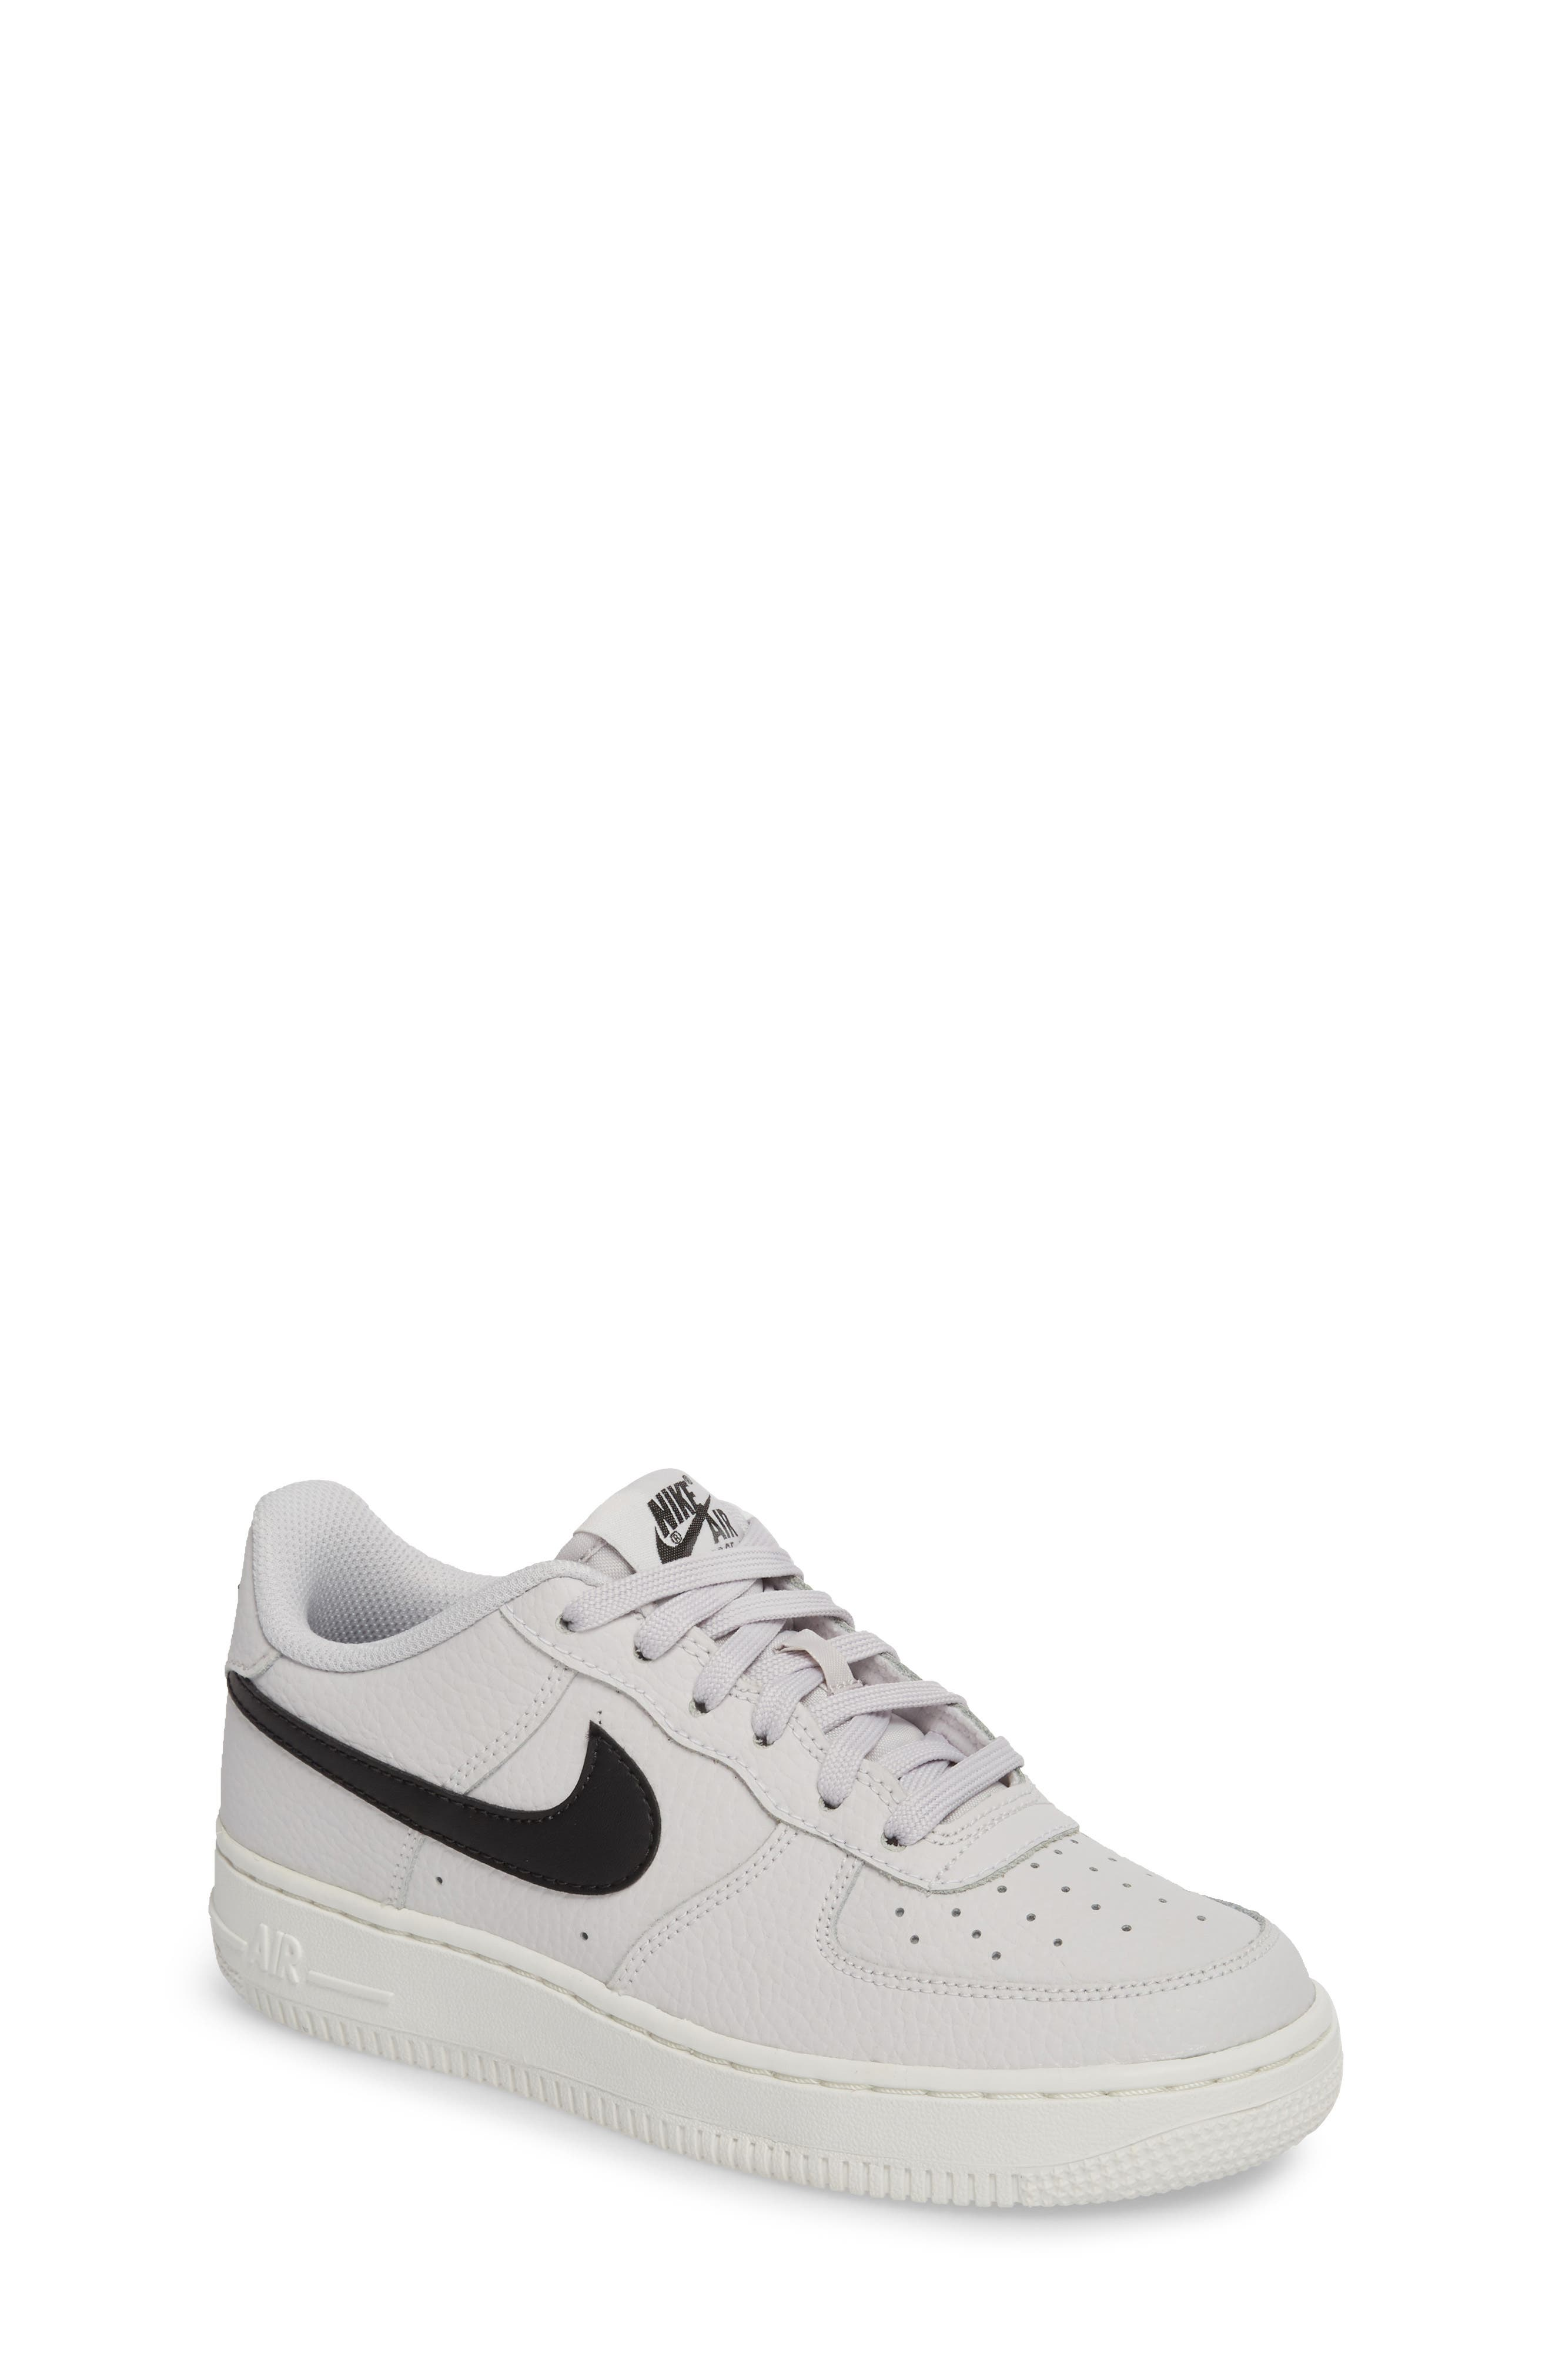 Alternate Image 1 Selected - Nike Air Force 1 Sneaker (Big Kid)